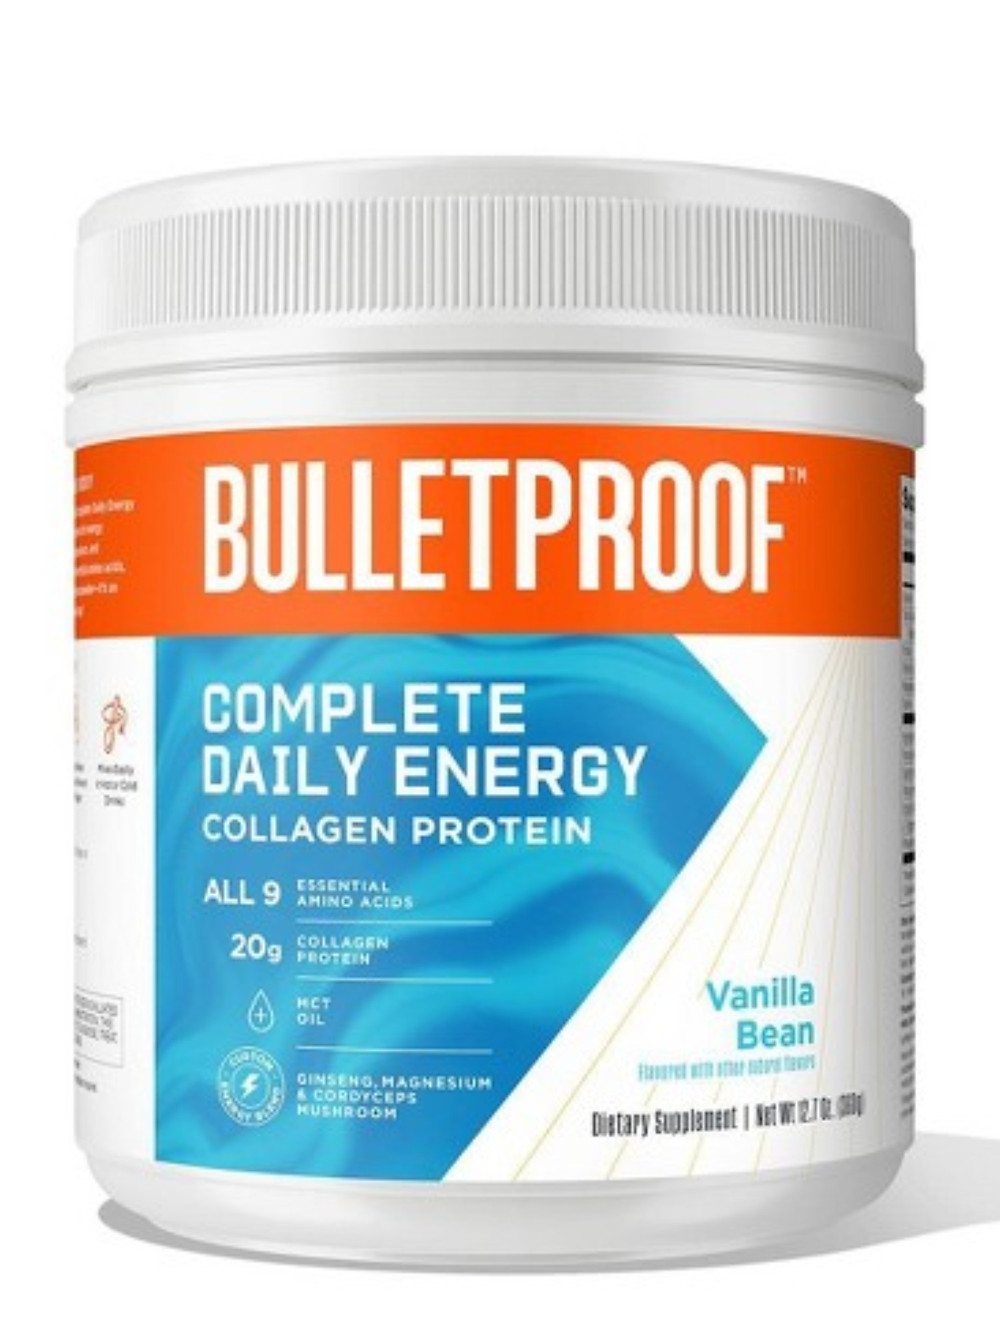 Bulletproof collagen- complete daily energy collagen protein